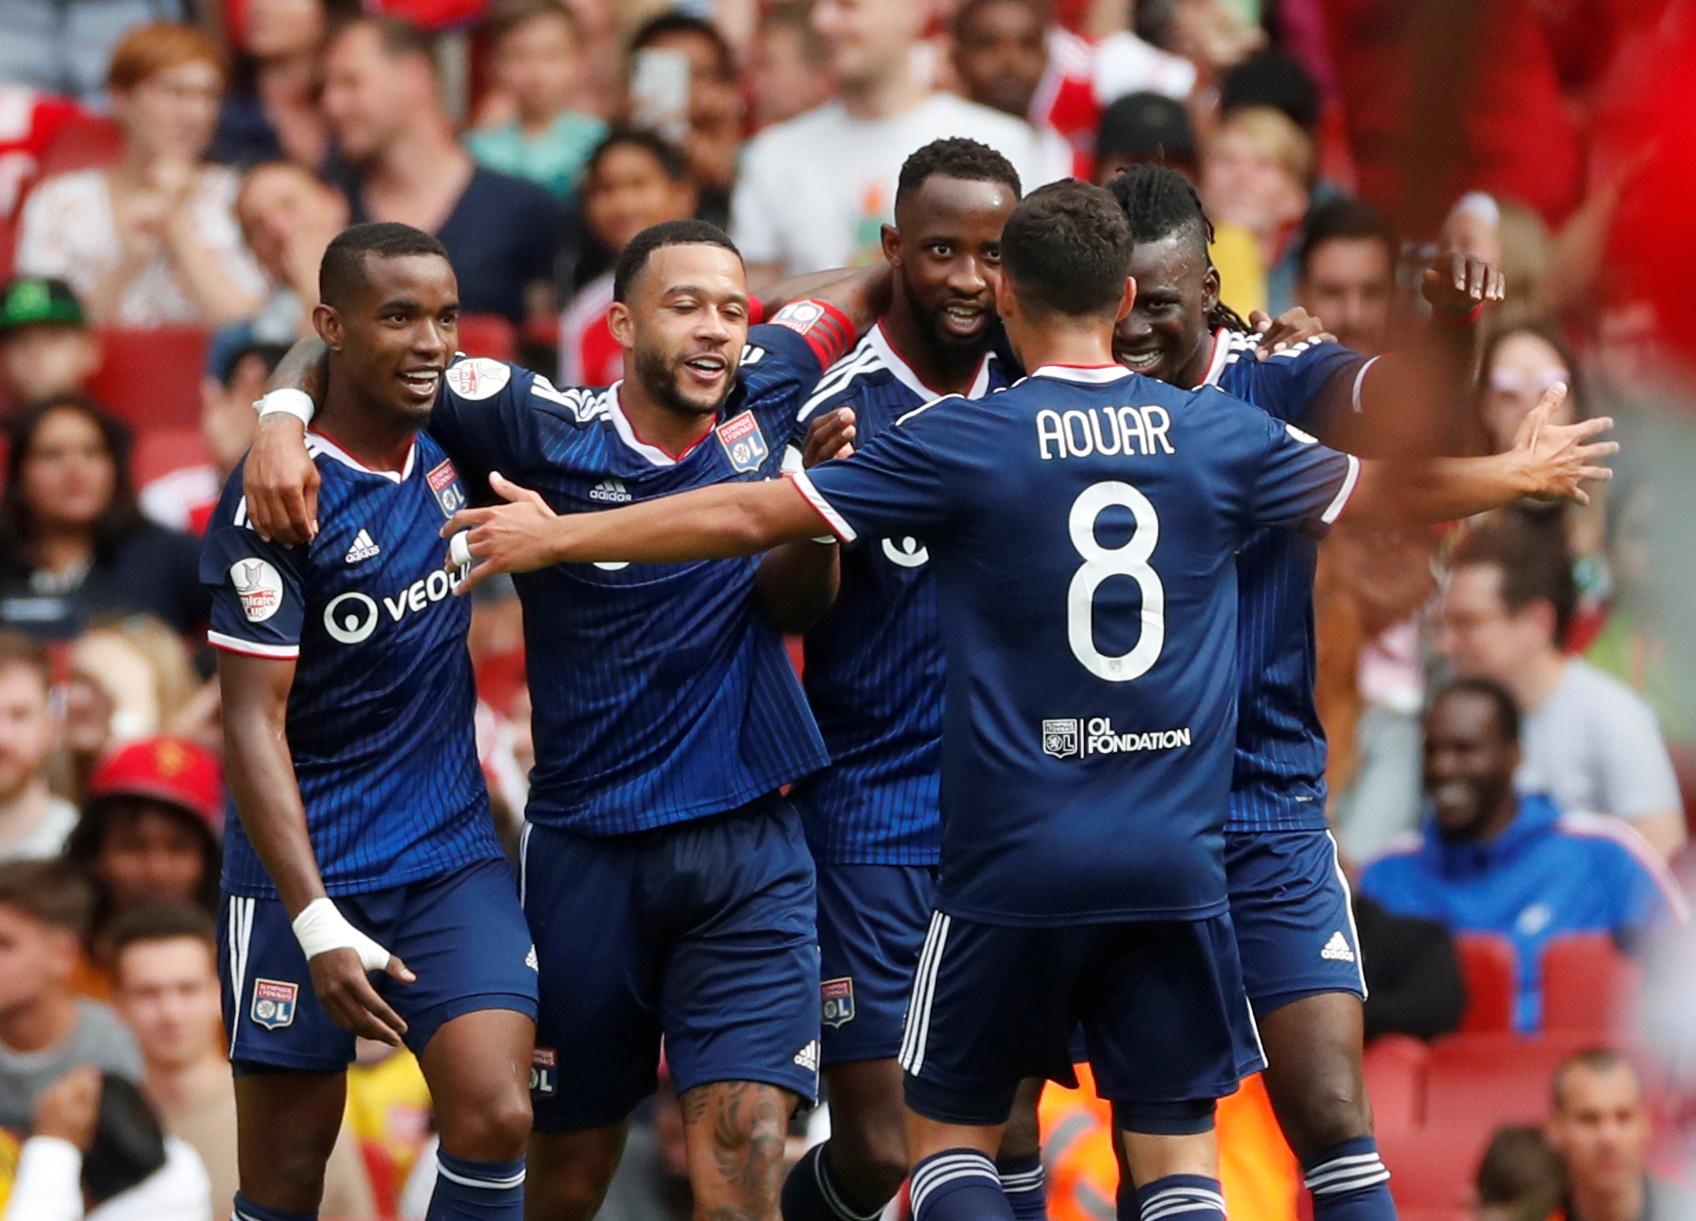 Football - Ligue 1 - Amical : Dembele et Lyon coulent Arsenal